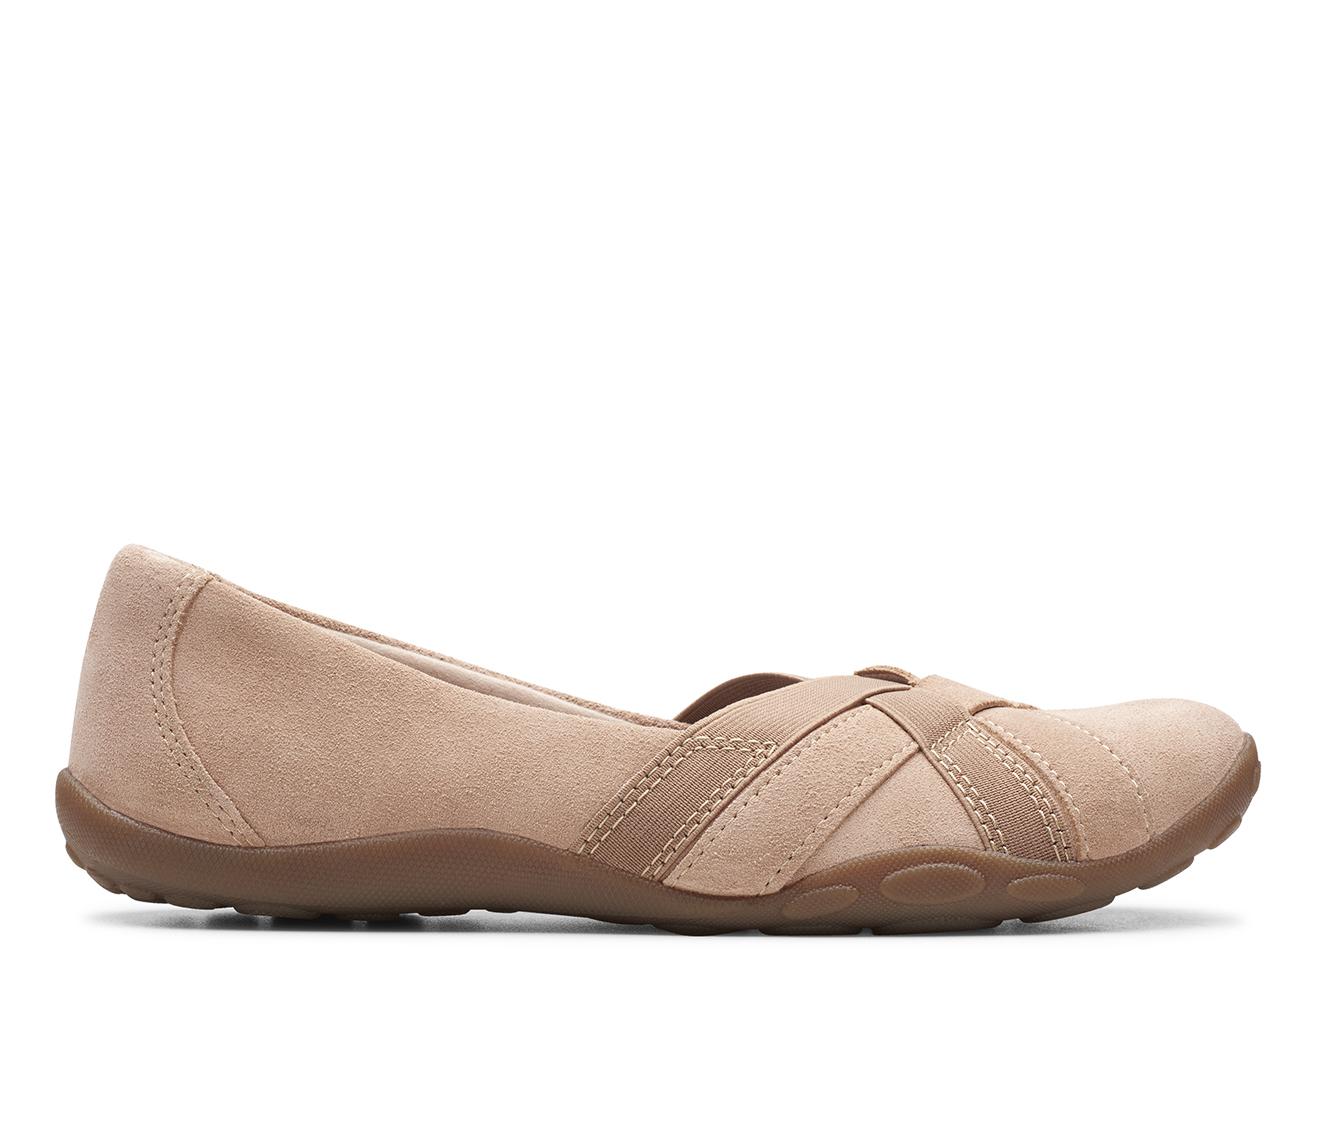 Clarks Haley Jay Women's Shoe (Brown Suede)